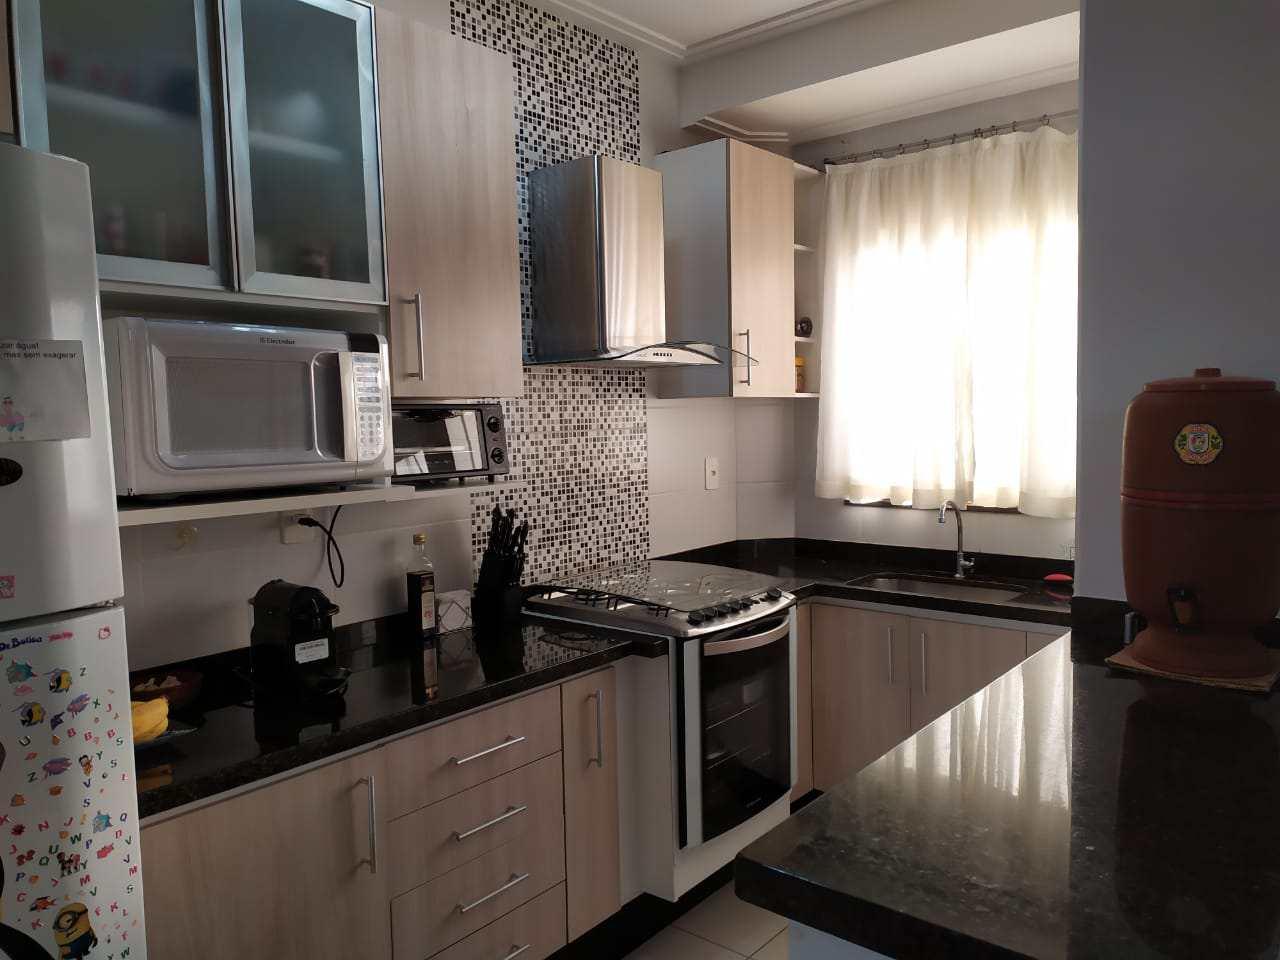 Apartamento com 2 dorms, Fernandes, Santa Rita do Sapucaí - R$ 315 mil, Cod: 39